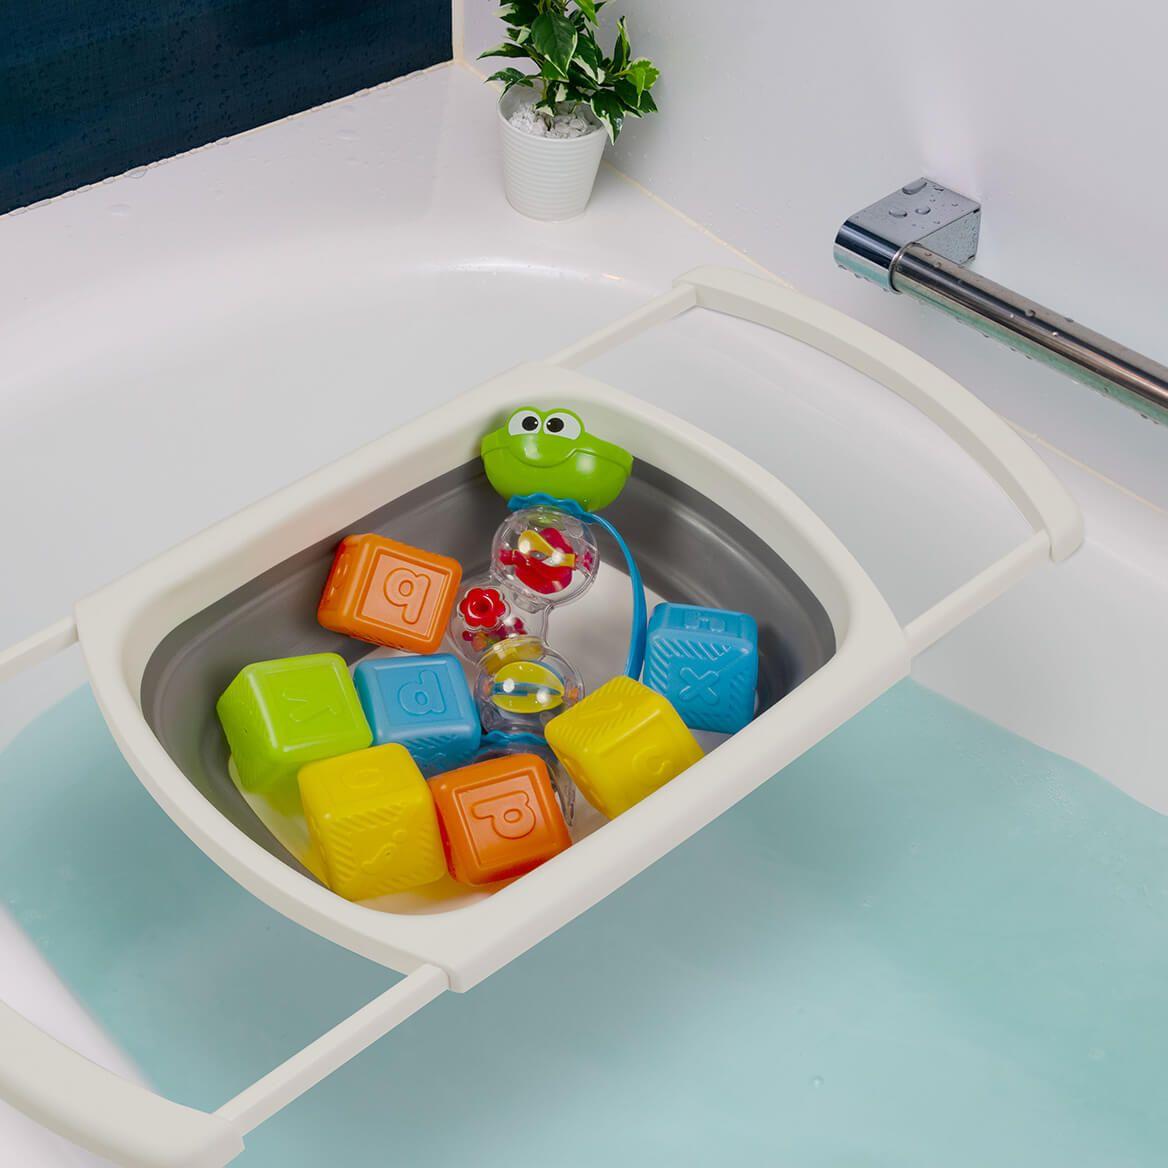 Collapsible Washing Basin-372020